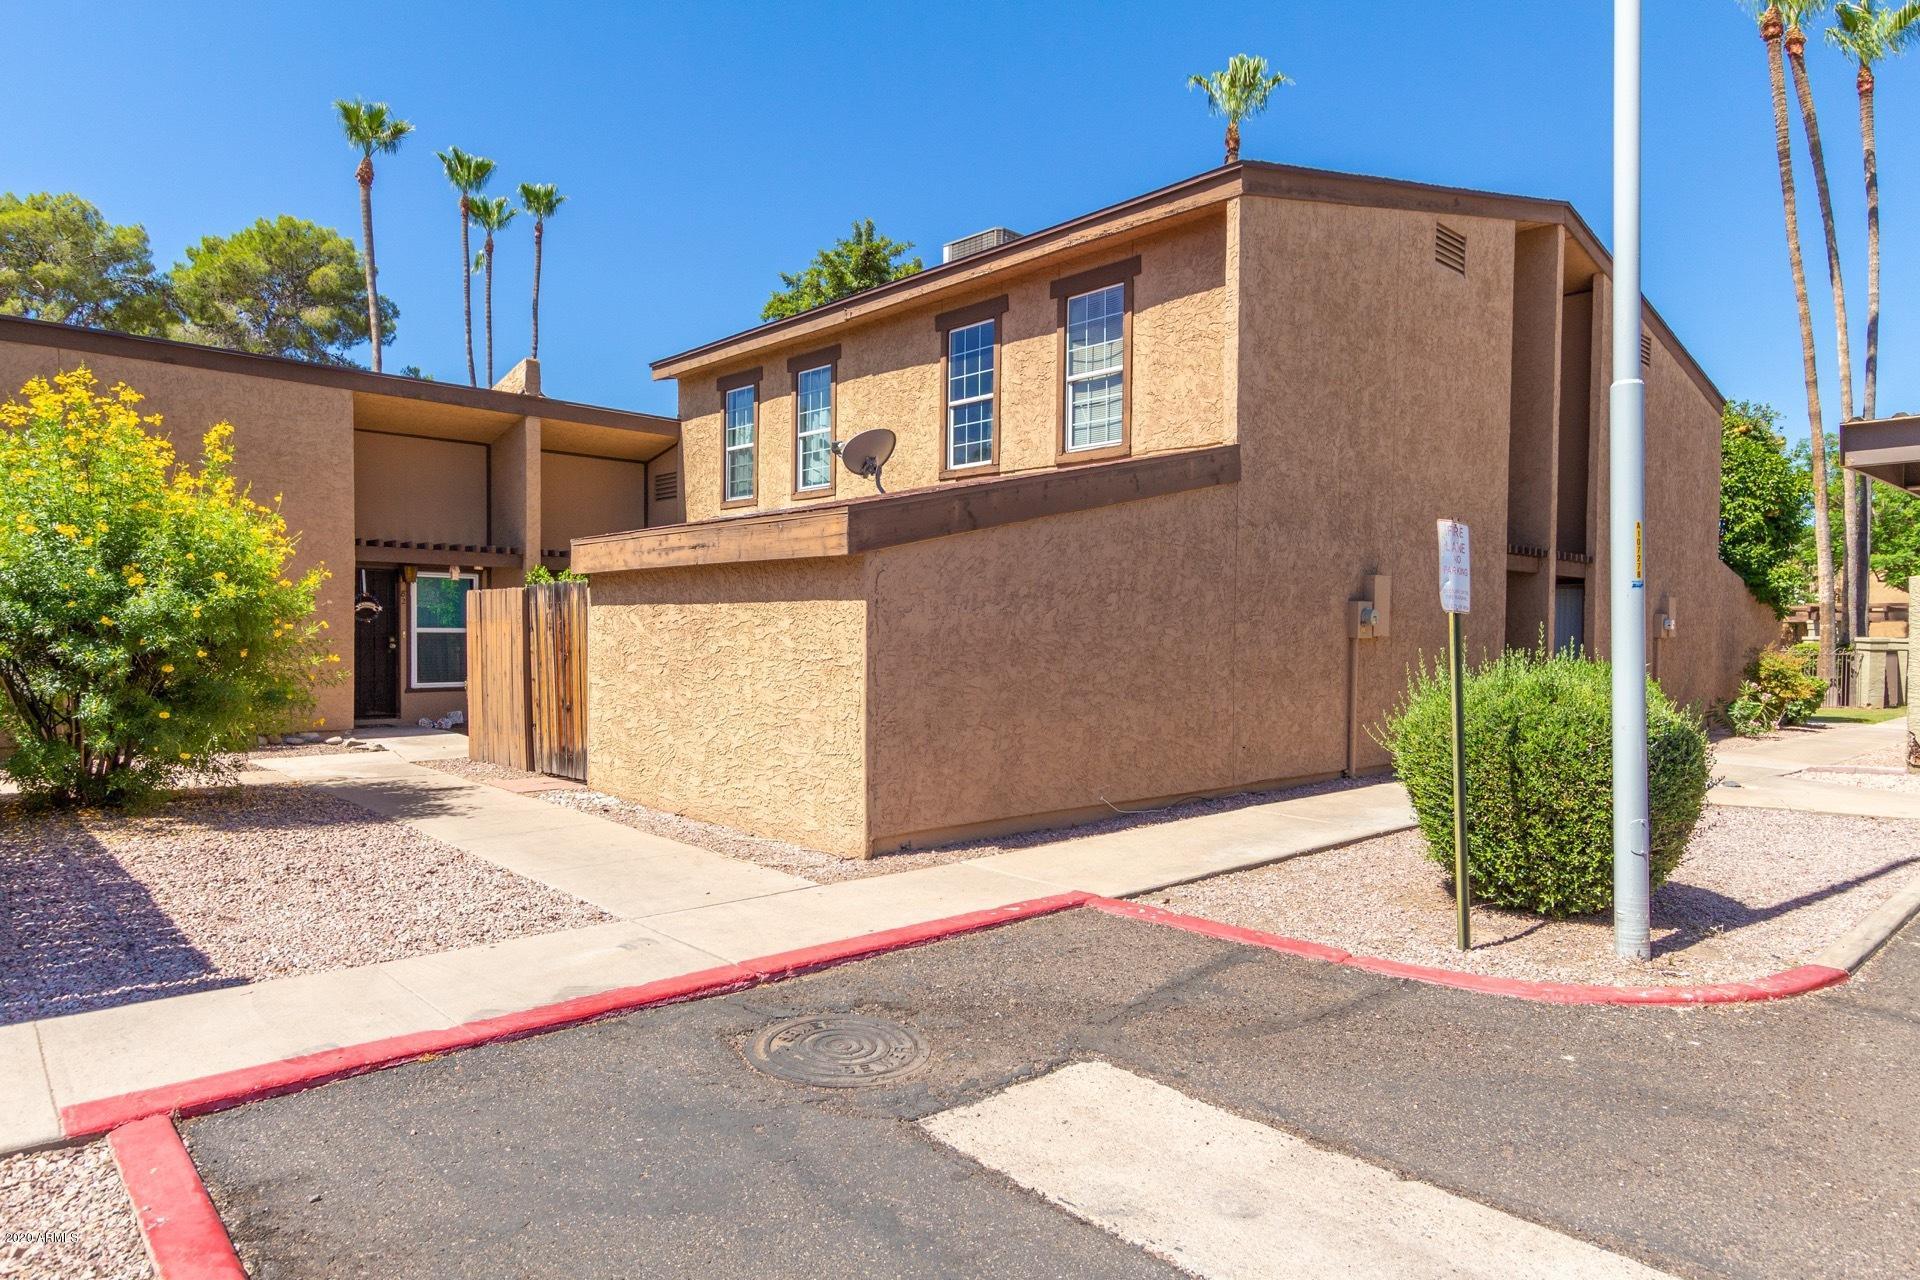 Photo of 1051 S DOBSON Road #83, Mesa, AZ 85202